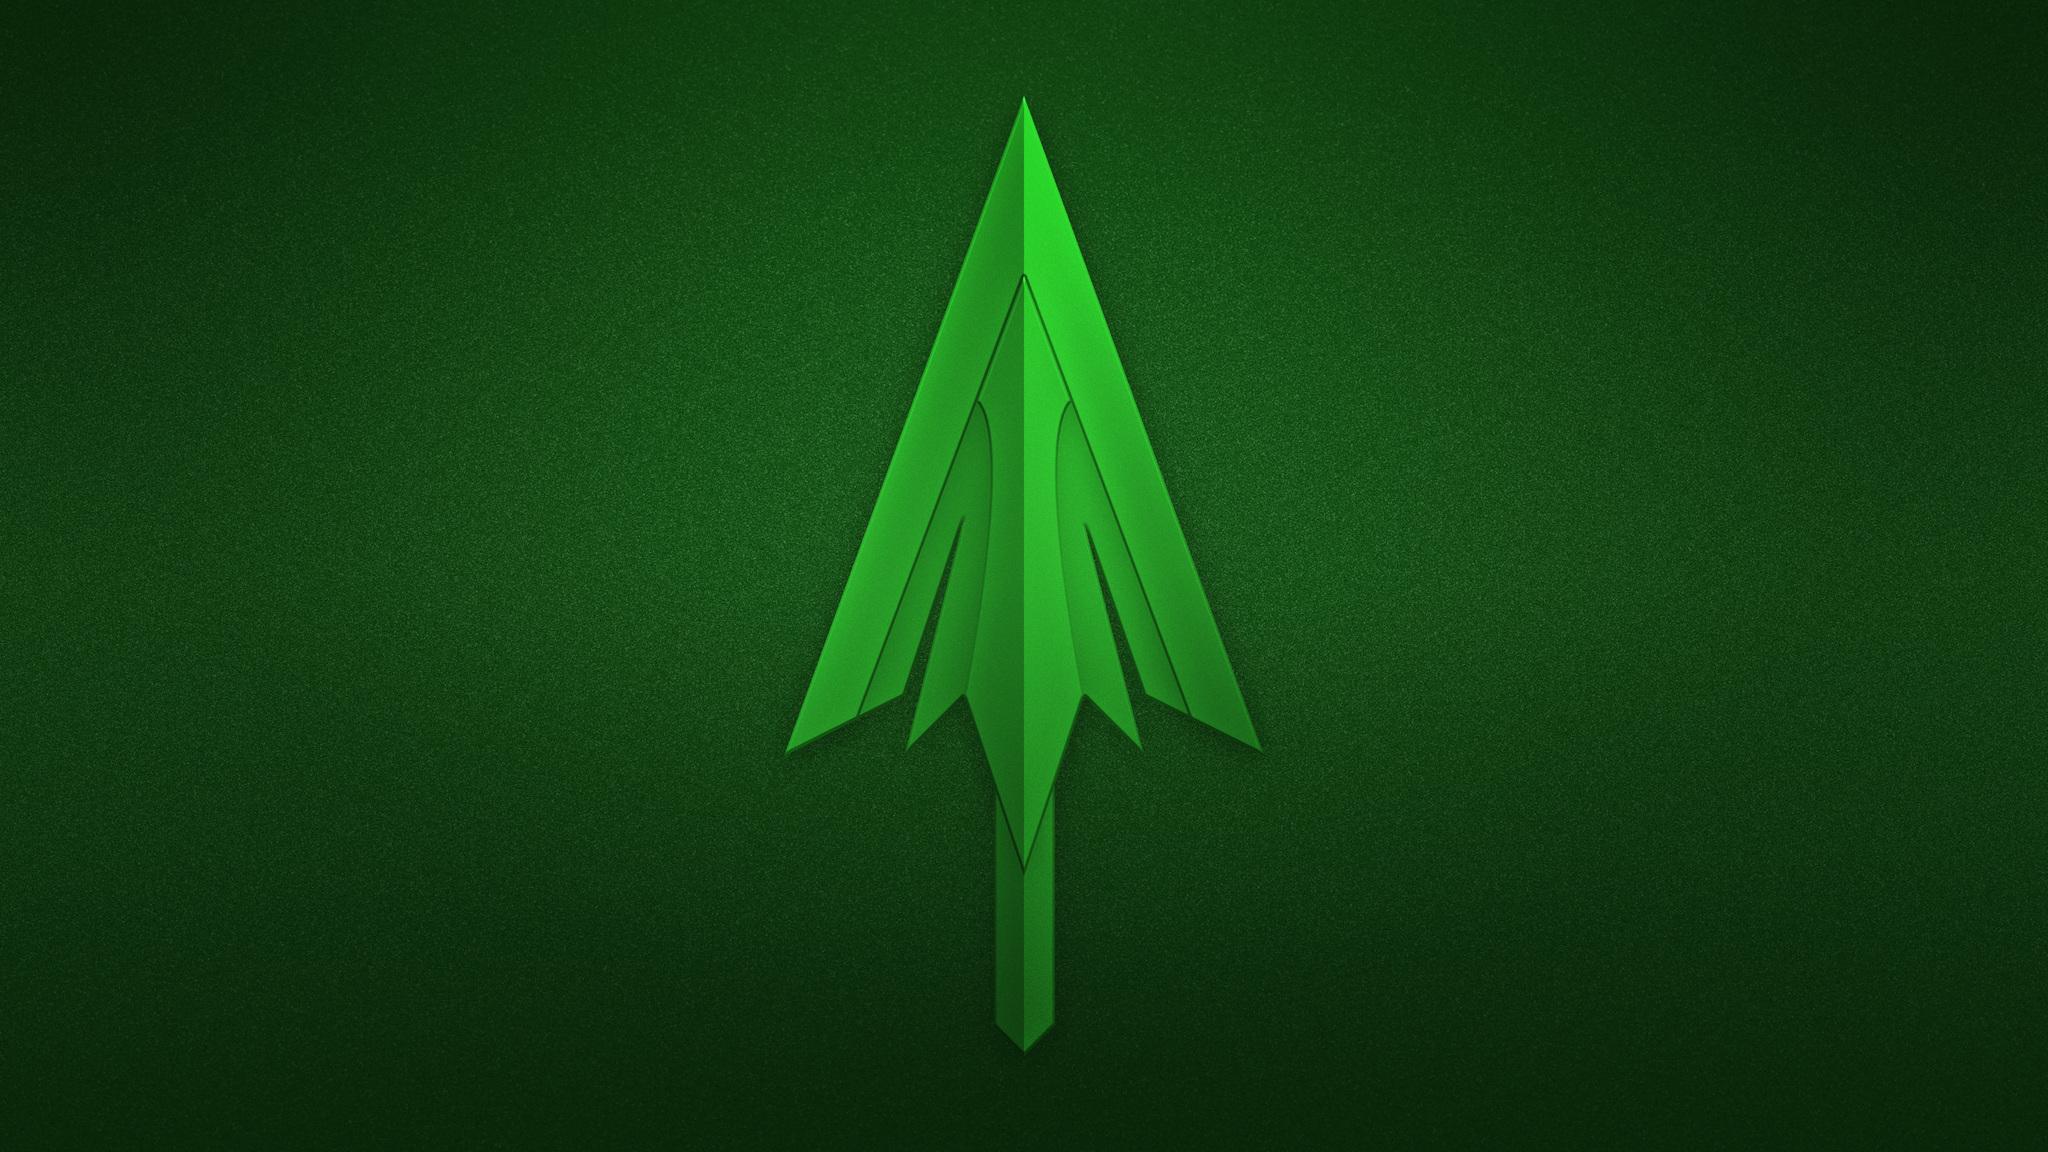 green-arrow-logo-ky.jpg